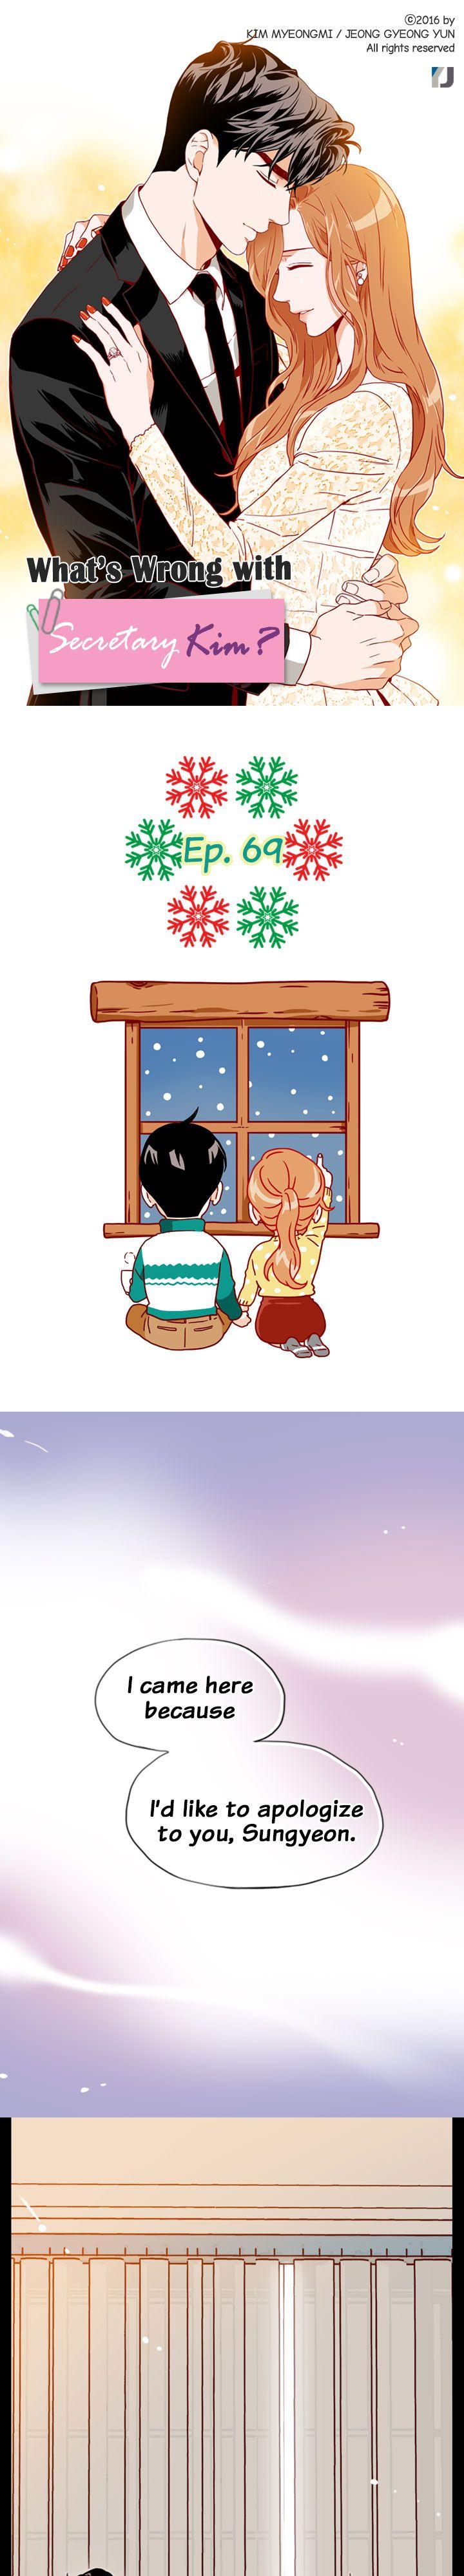 https://manga.mangadogs.com/comics/pic2/15/25807/960726/33929b69461fed5d5e93a98dc968ac26.jpg Page 1